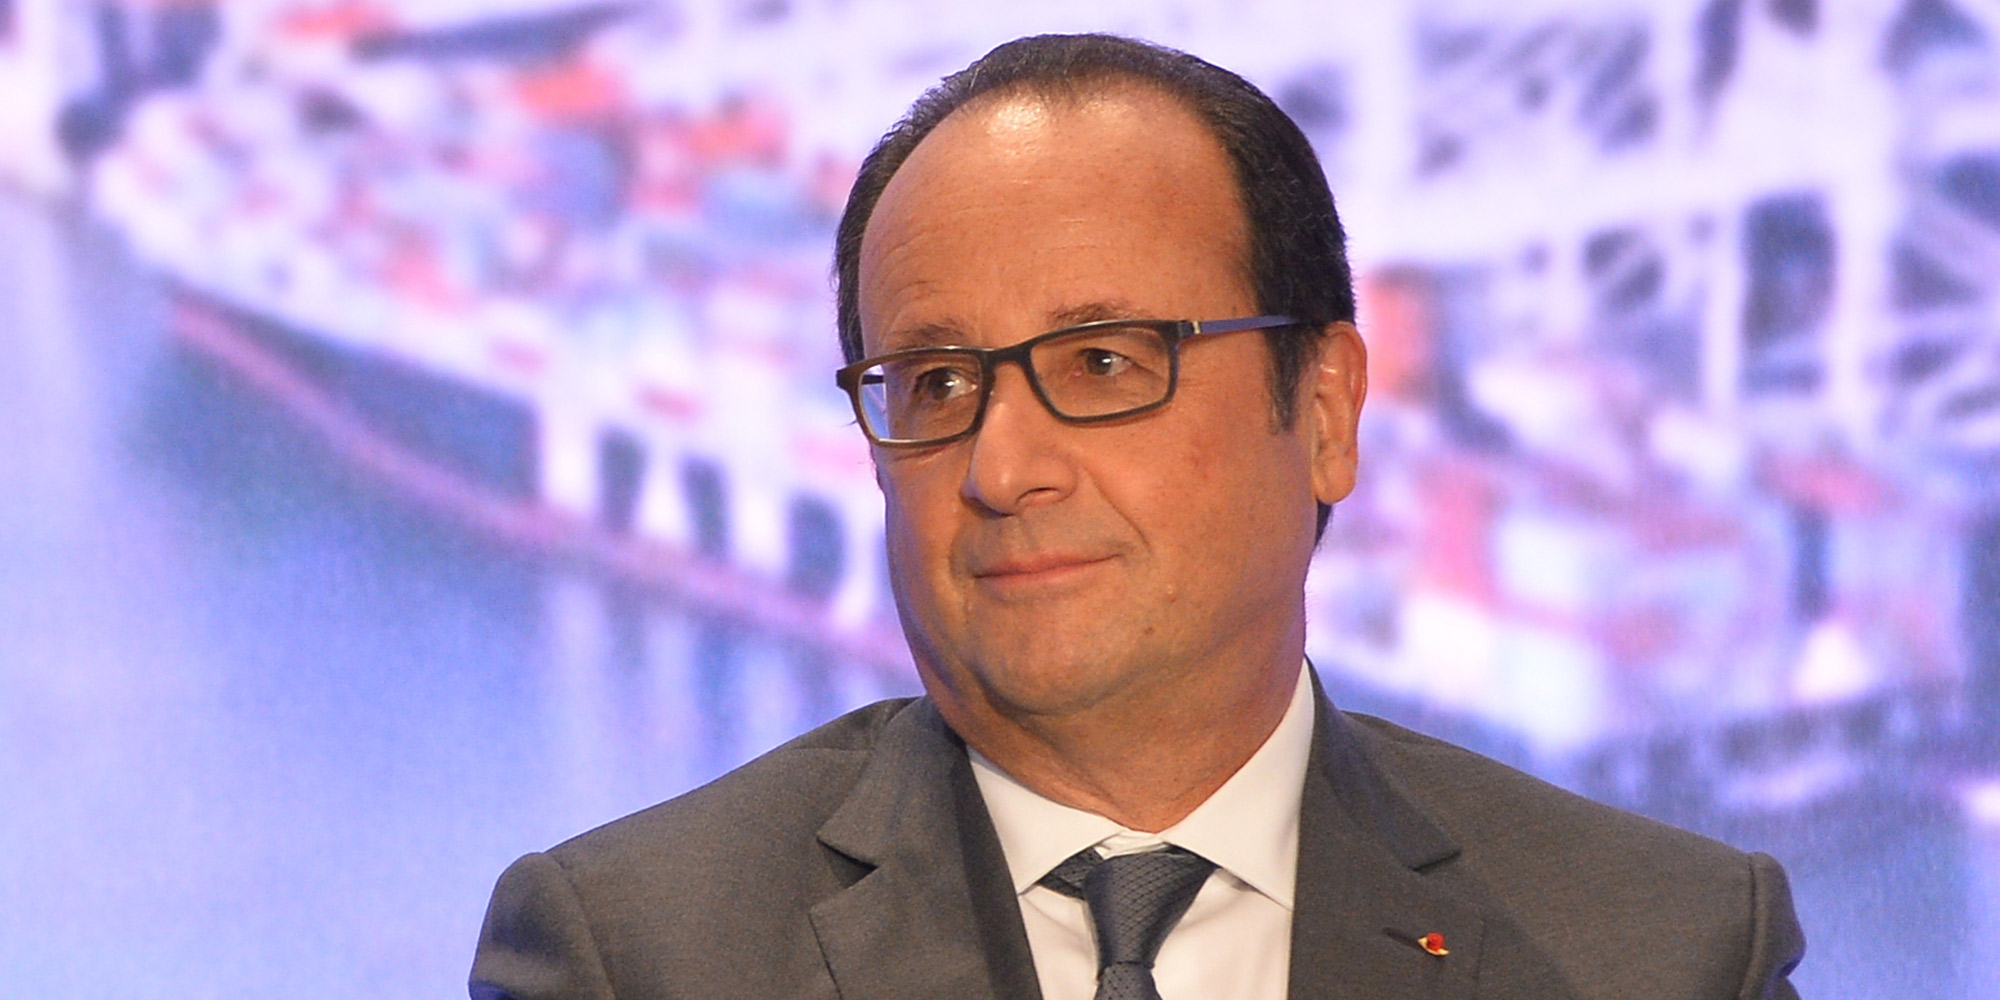 François Hollande. (Crédits photo : Abaca Press)